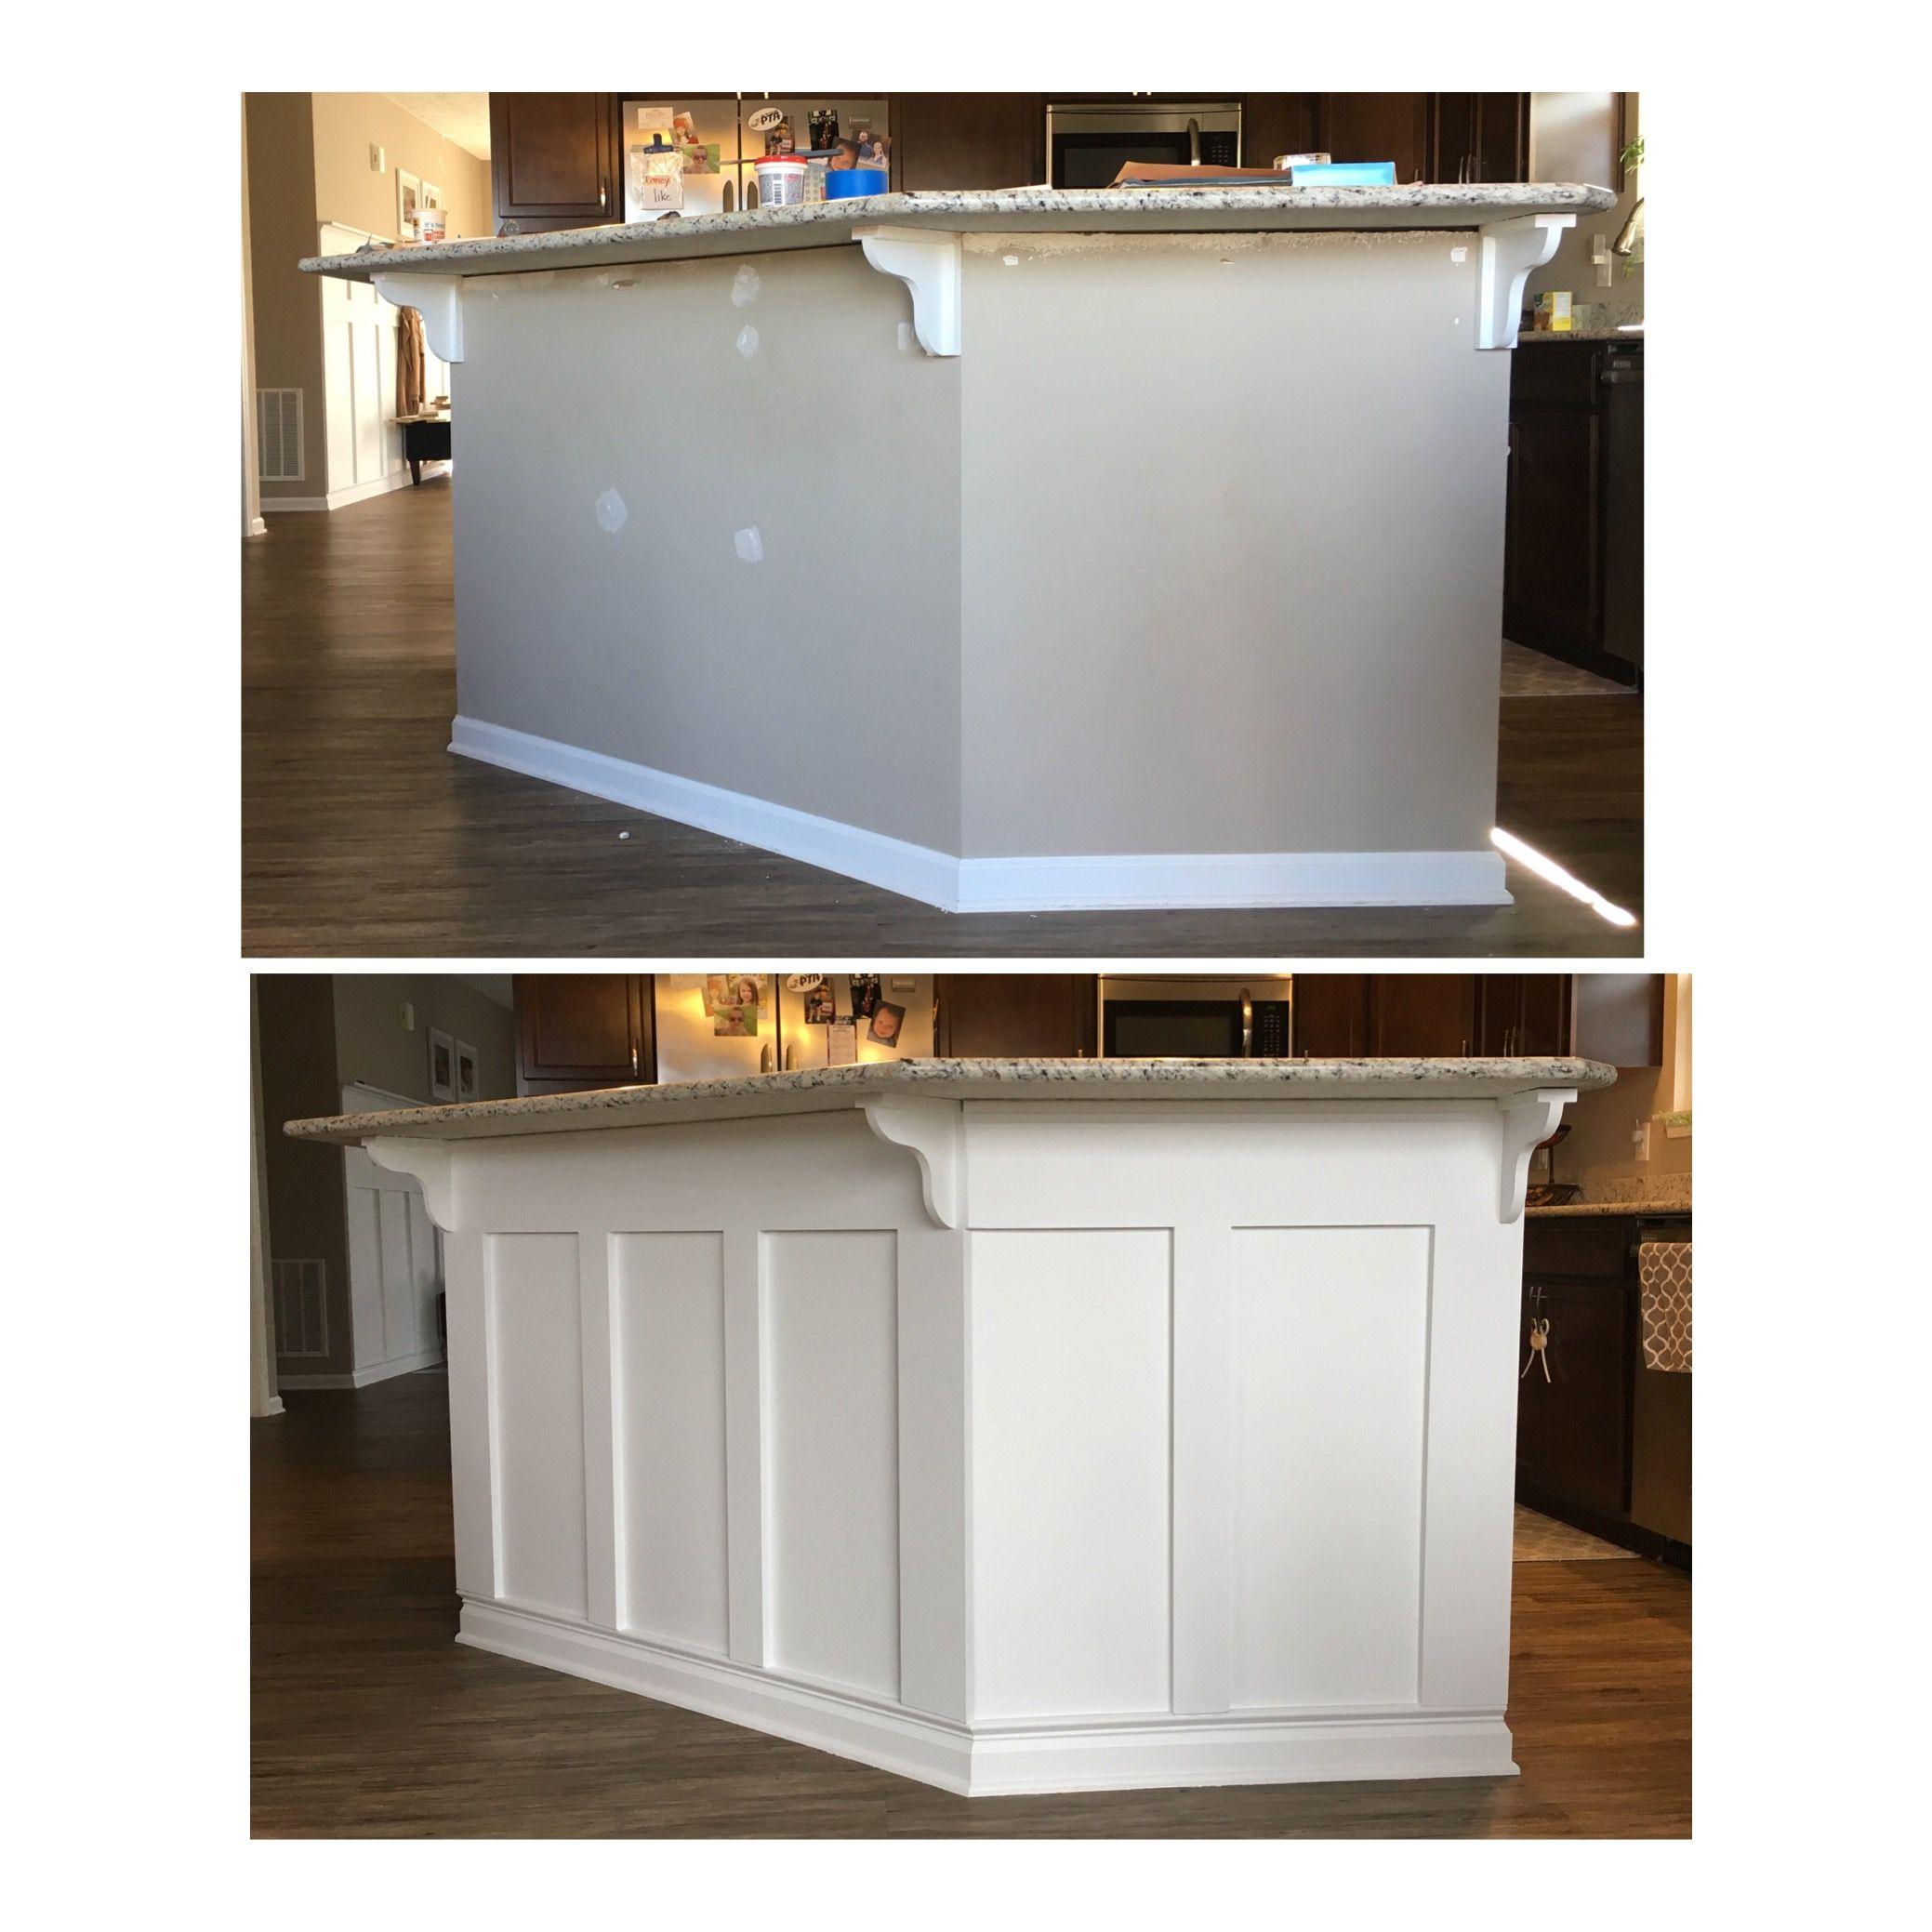 Diy Board And Batten Kitchen Island Kitchen Island Makeover Updating House Home Remodeling Update kitchen island ideas